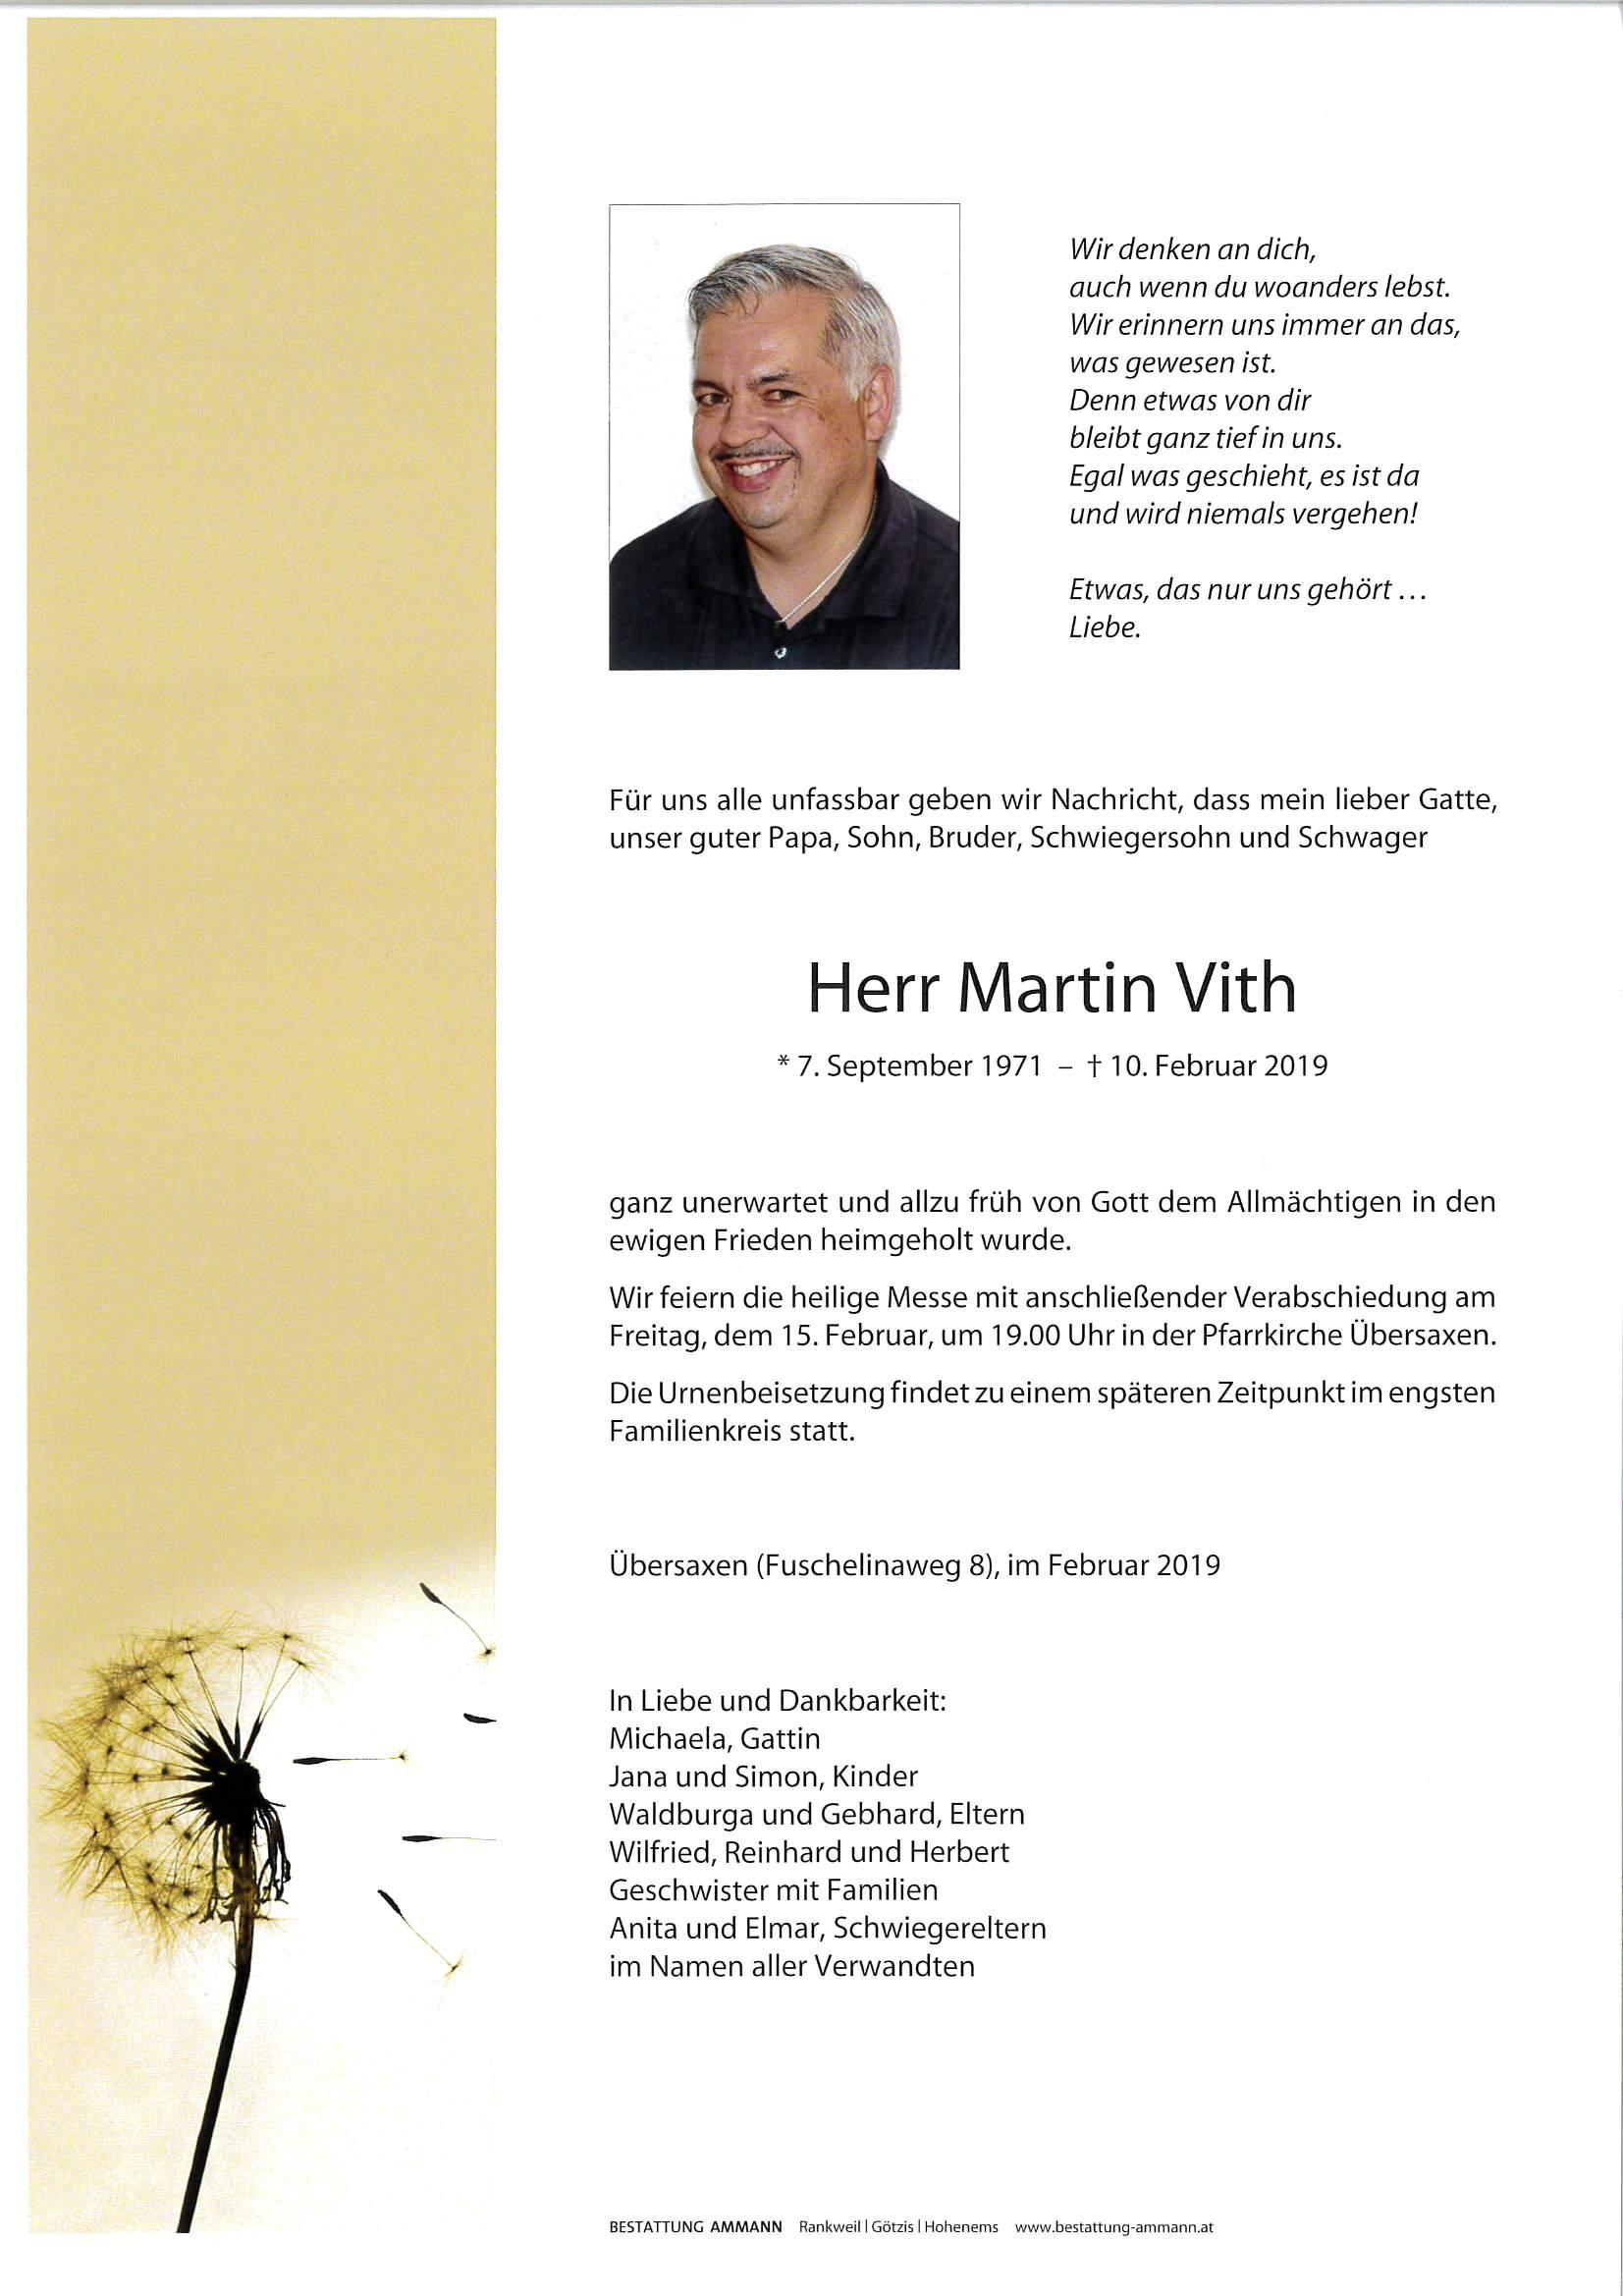 Martin Vith.jpg